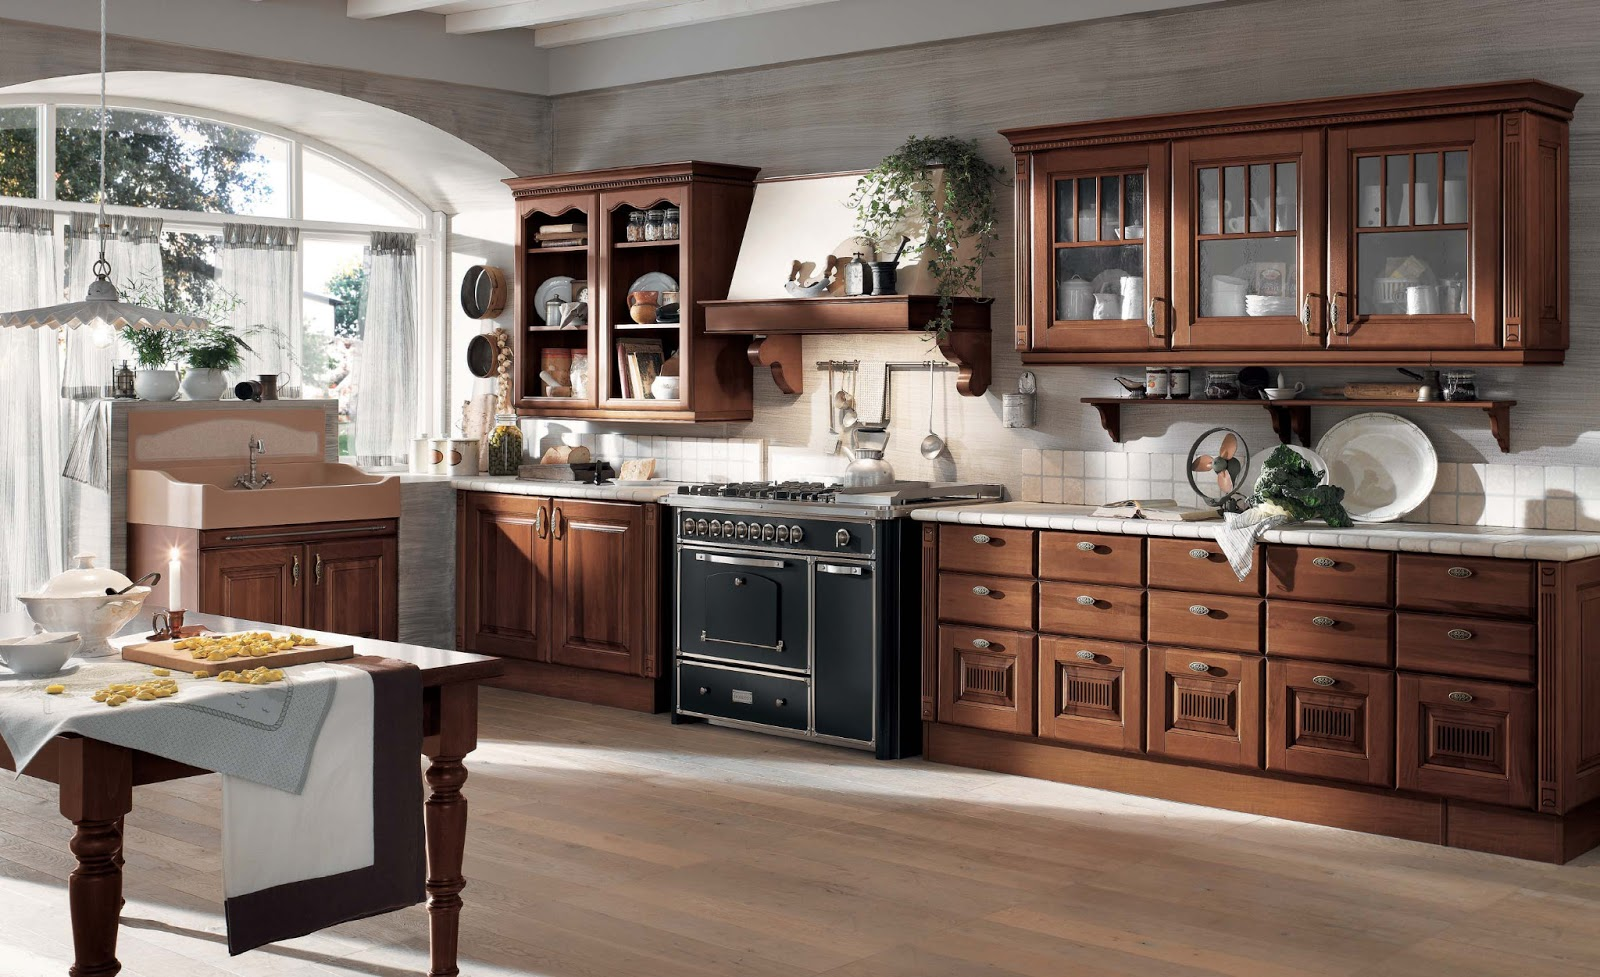 kitchen design kitchen design software Kitchen Design